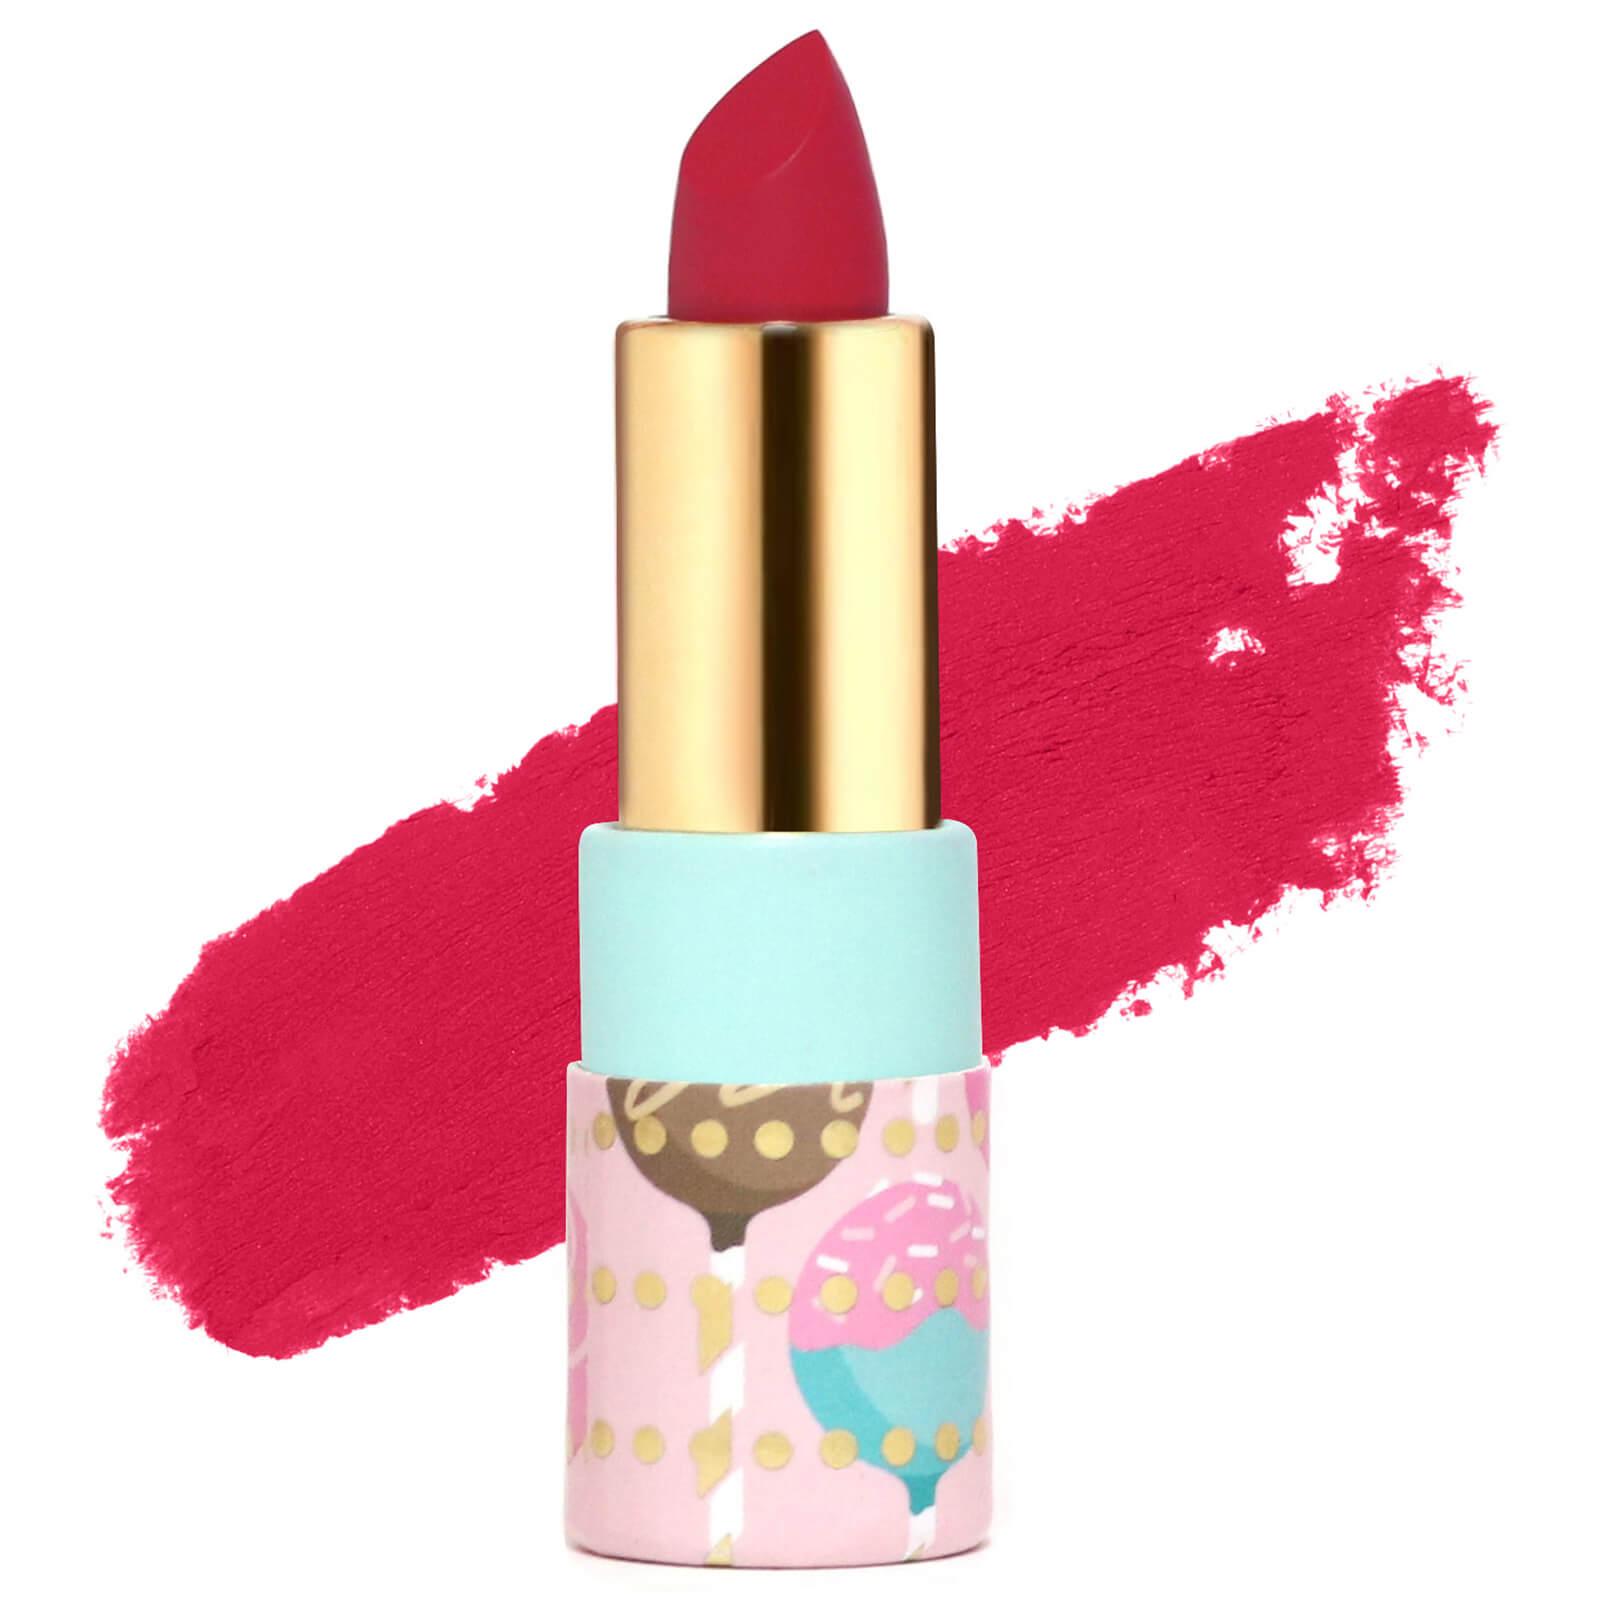 Купить Beauty Bakerie Cake Pop Lippies 0.05oz (Various Shades) - Glam Jam